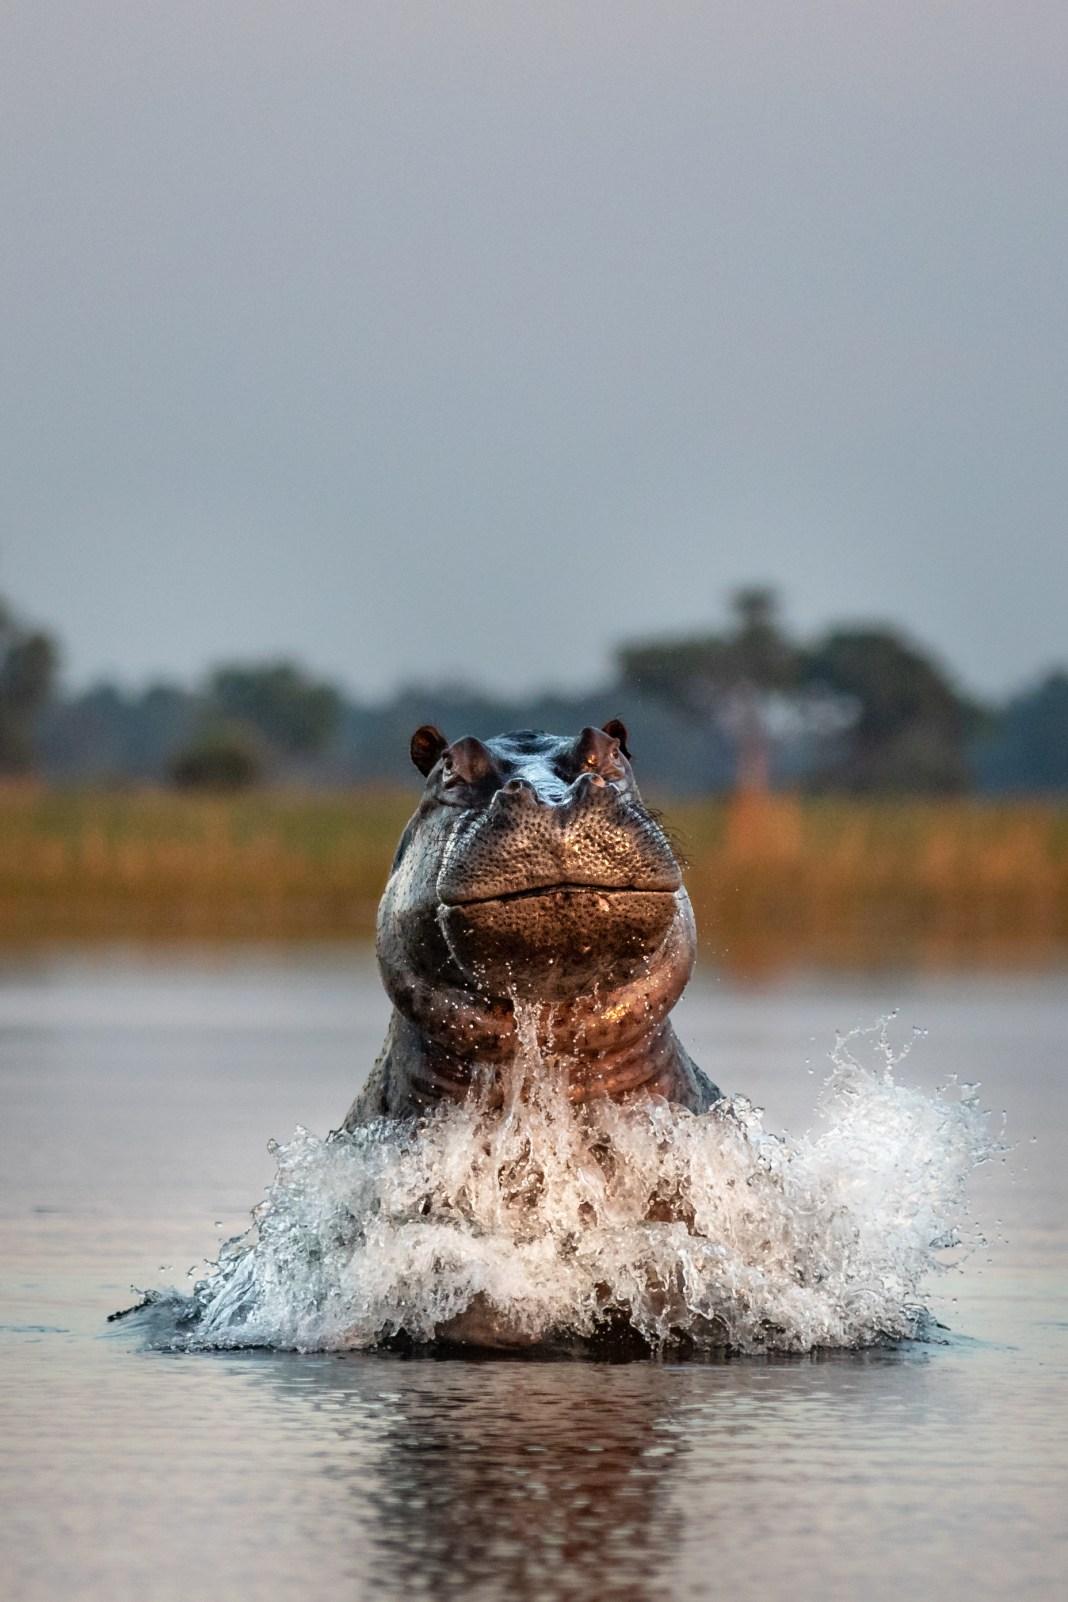 Hippo Emerging from Water in Botswana